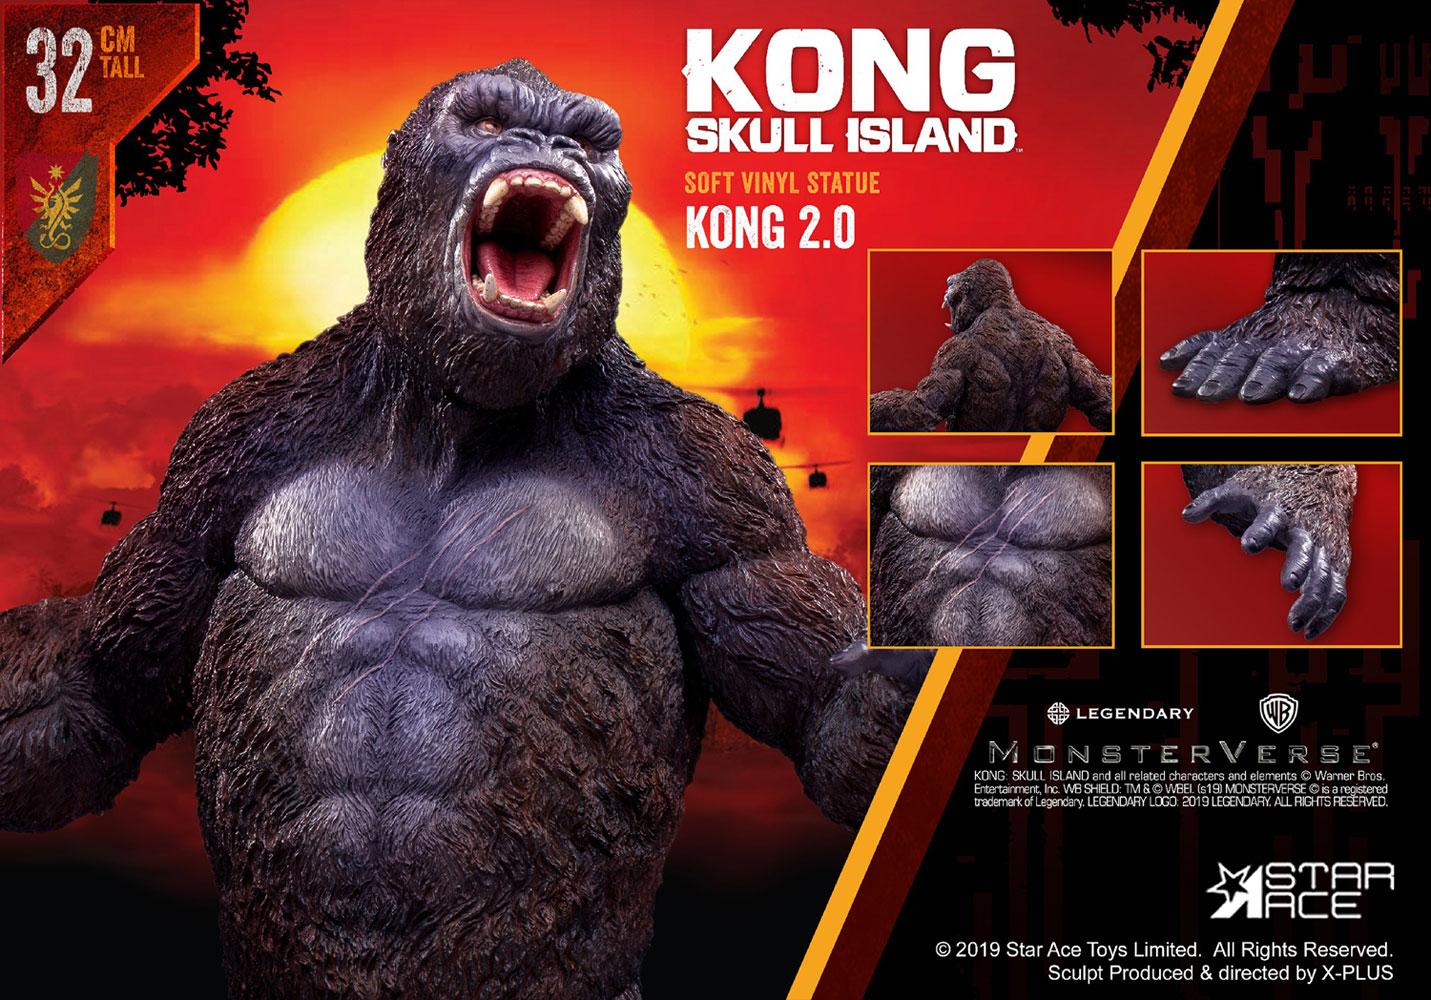 Kong Skull Island Soft Vinyl Statue: Kong 2.0  - Star Ace Toys Limited